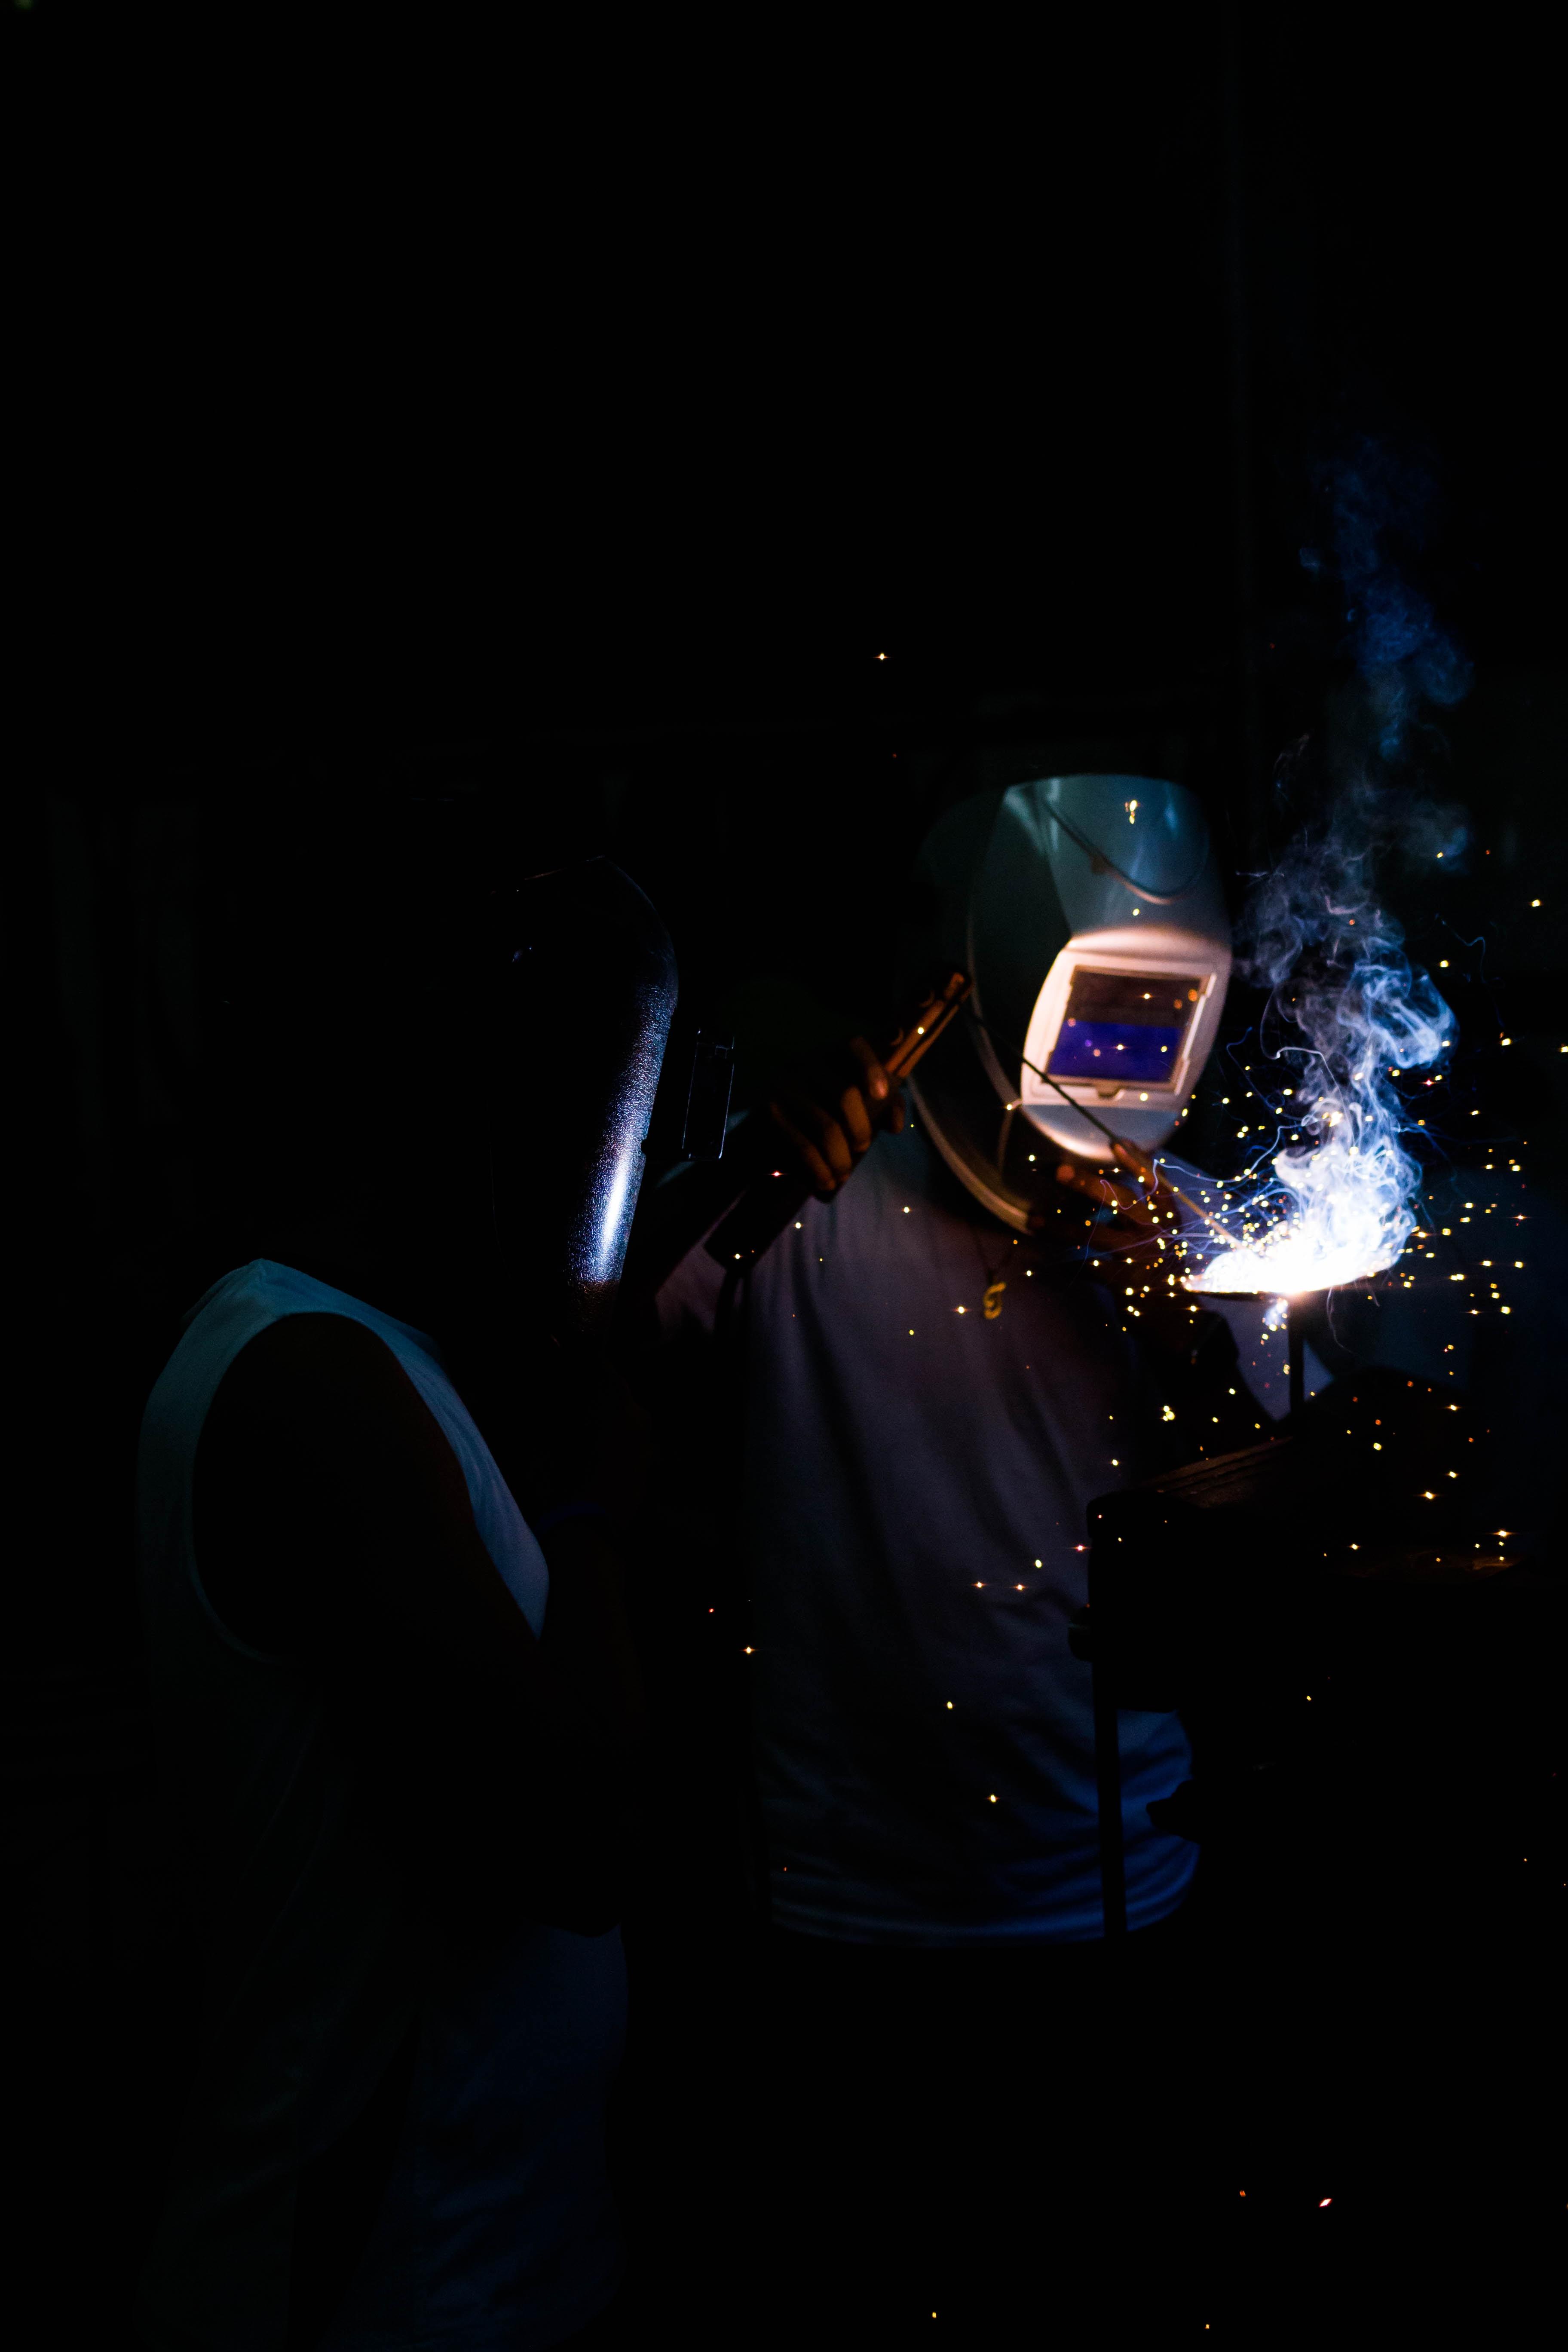 Two people weld in the dark in Nejapa